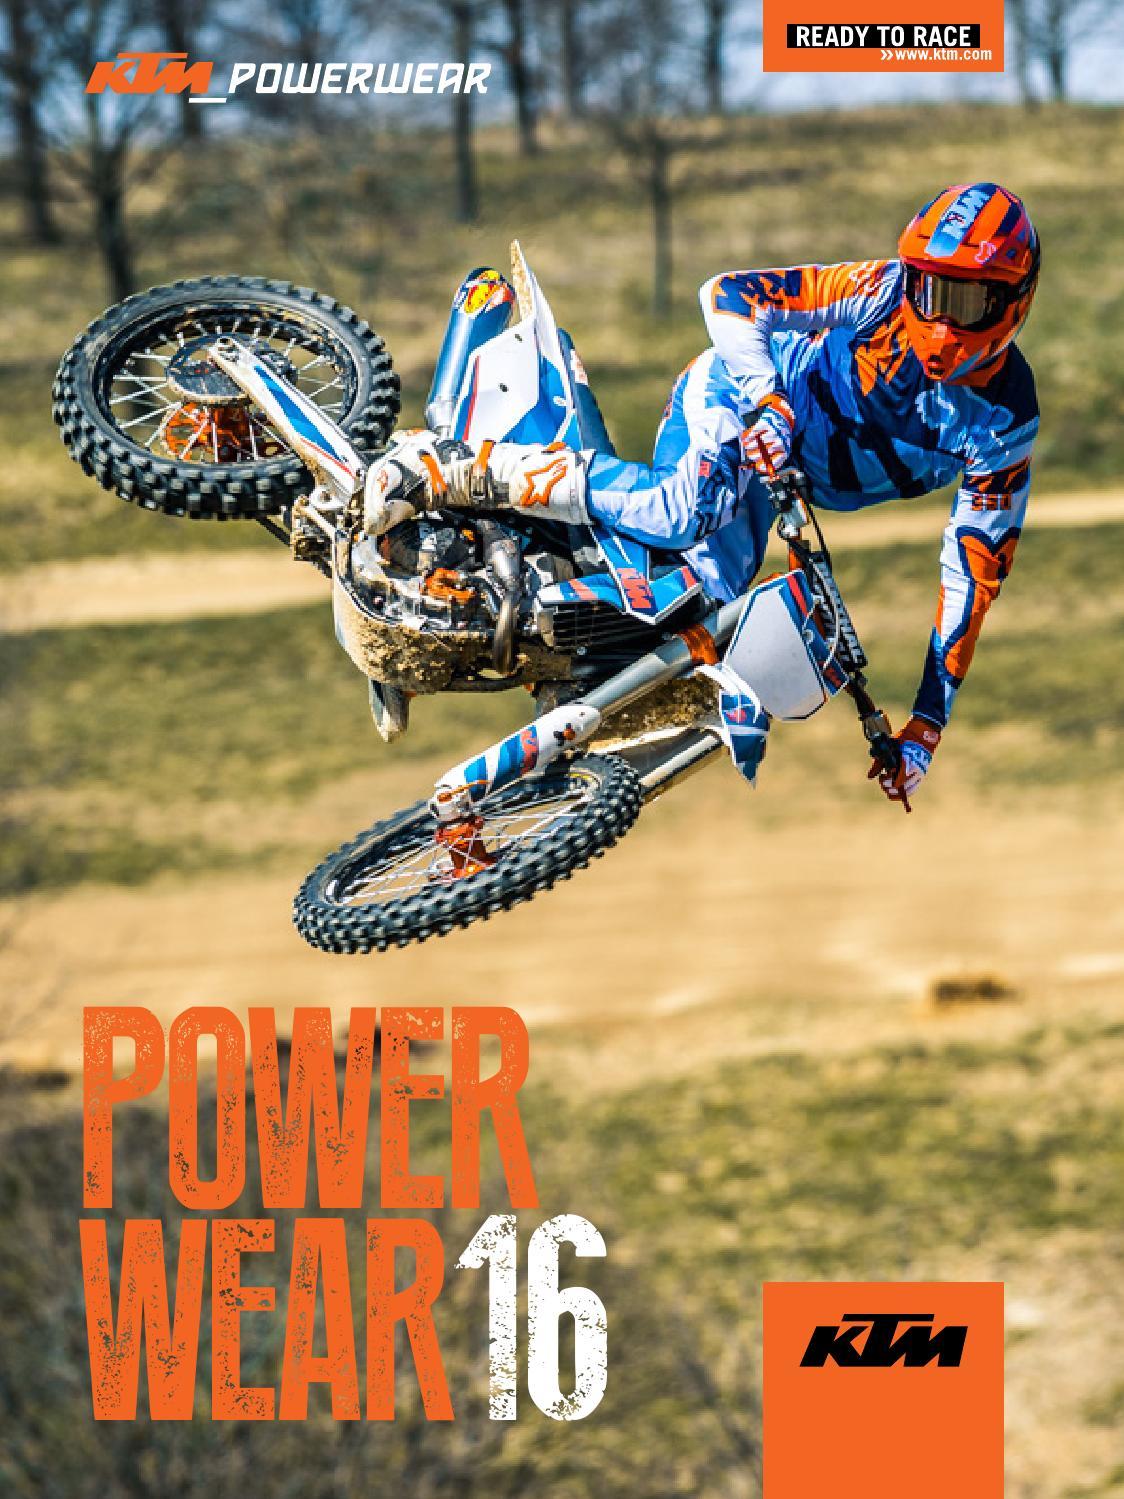 KTM PowerWear Catalog 2016 USA by KTM GROUP issuu